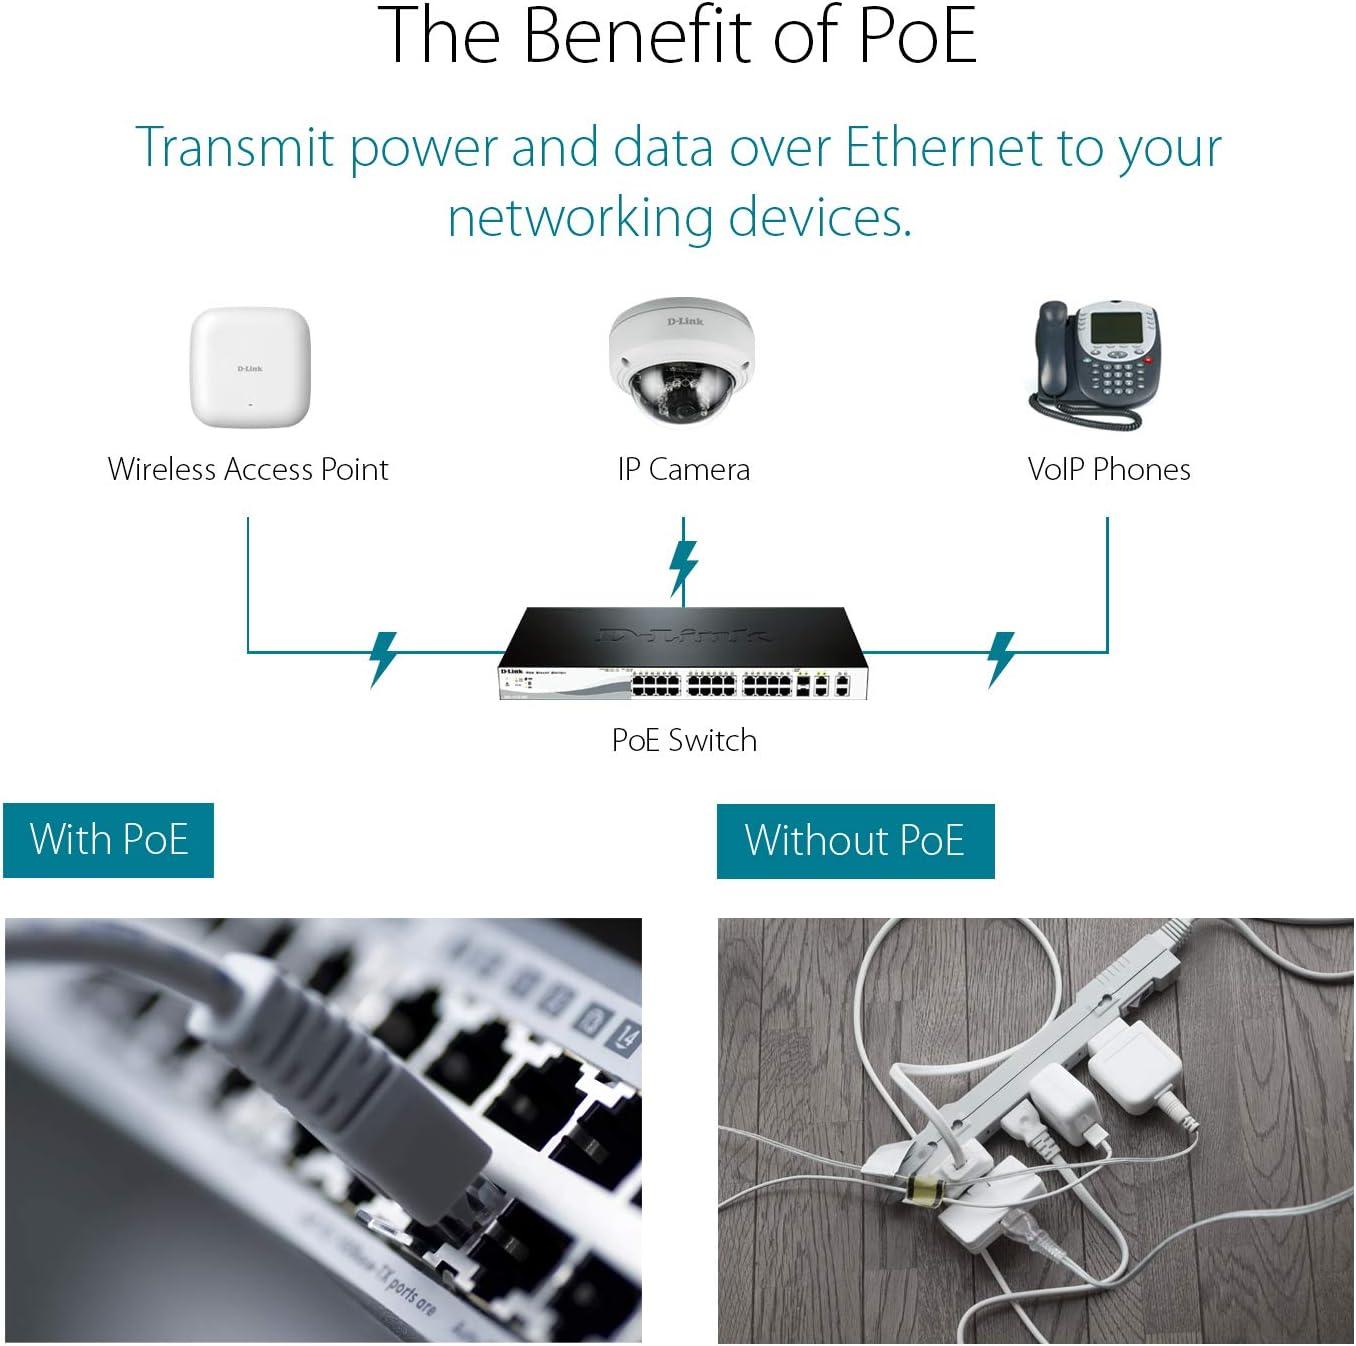 D-Link DaP-2660 - Punto de Acceso PoE WiFi Ac1200 Dual Band para Interior (802.11ac Hasta 1200 Mbps), Puerto Gigabit 1000 Mbps, WPA2 Enterprise, ...